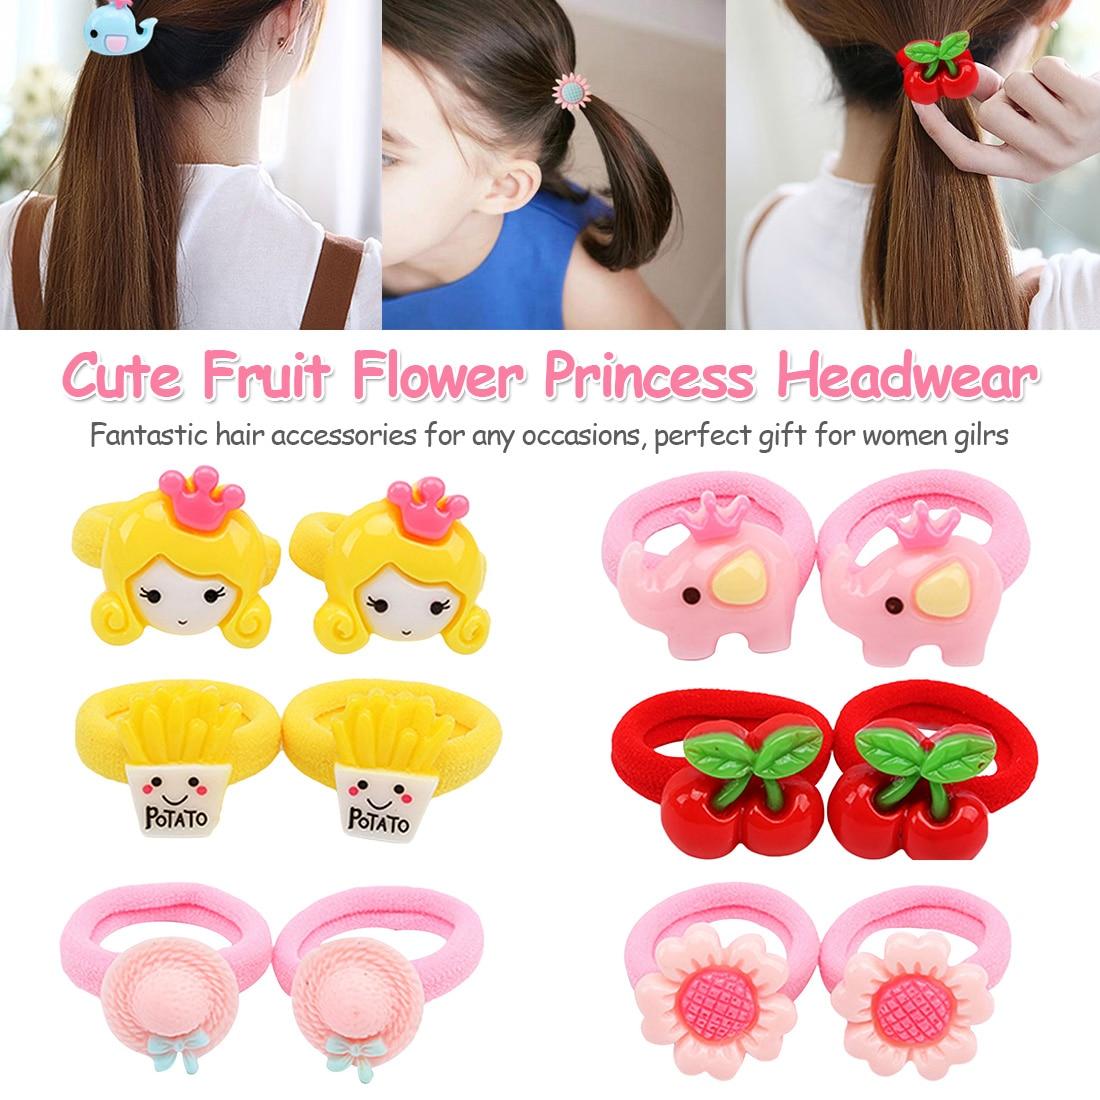 2PCS New Cute Cartoon Rubber Band Hair Ring Fashion Kids Flower Fruit Animal Rubber Bands   Headwear   Girl Hair Accessories